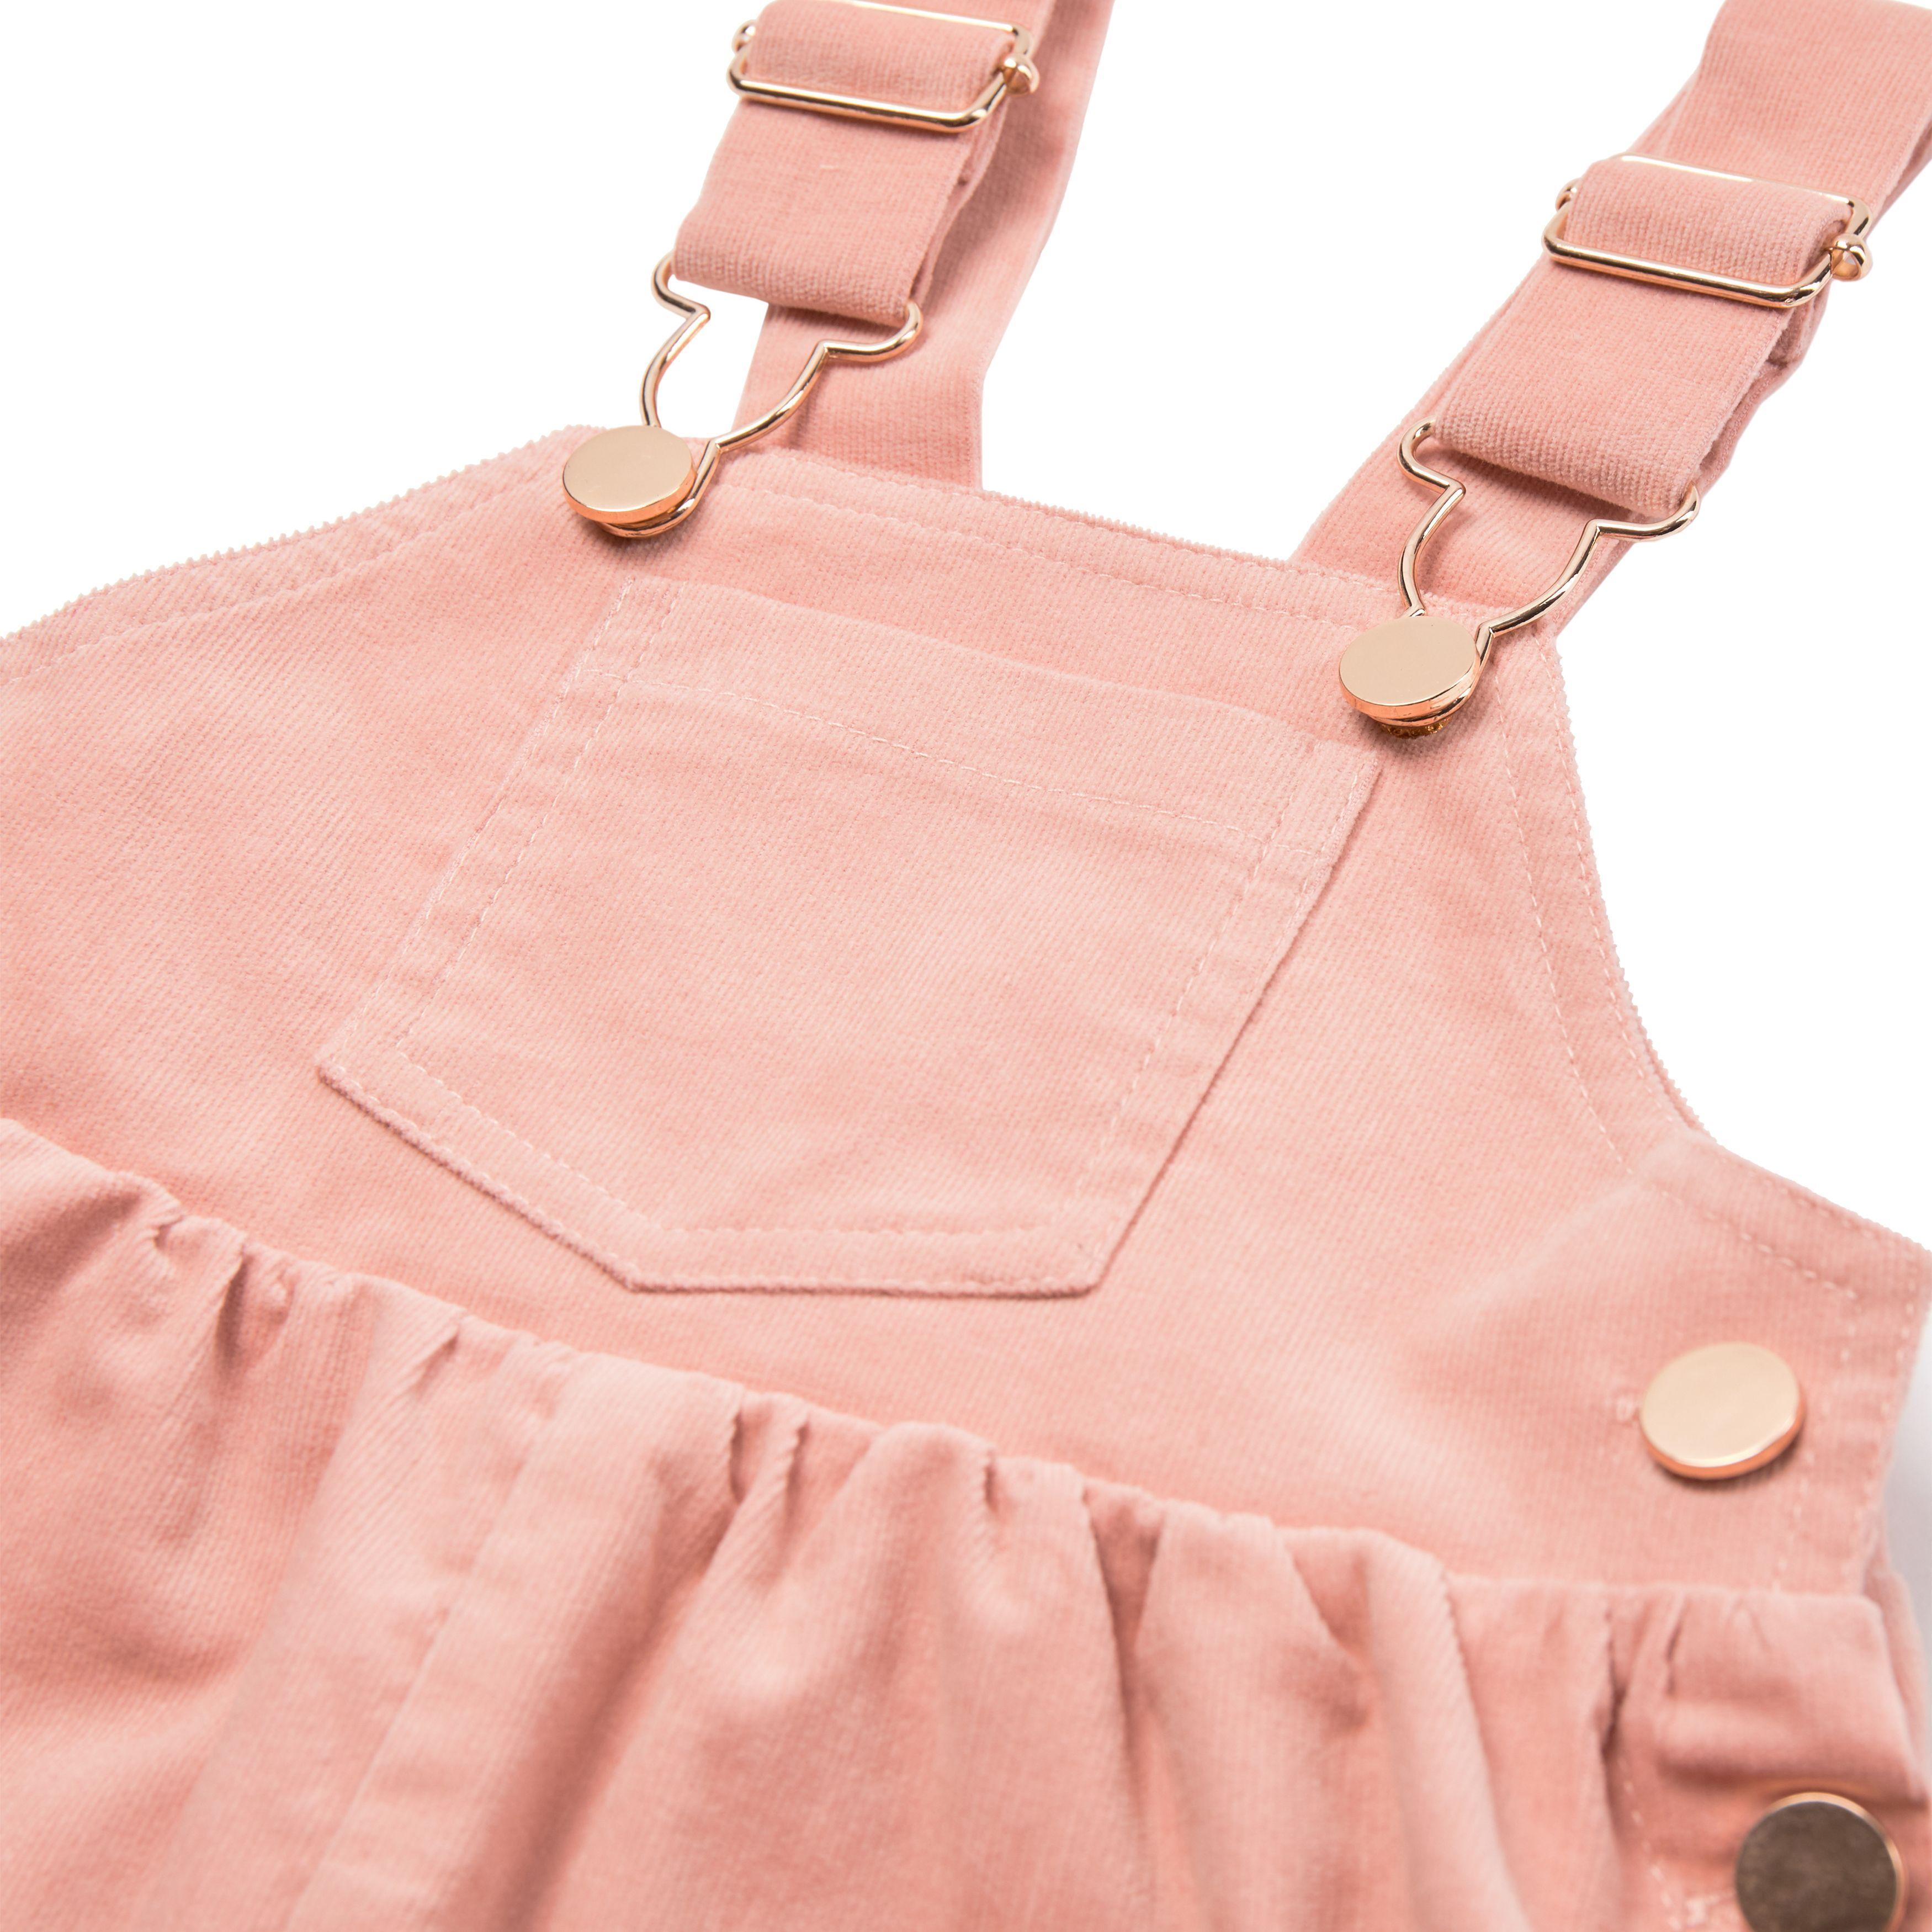 Petit by Sofie Schnoor Malin overalls, light rose, 68